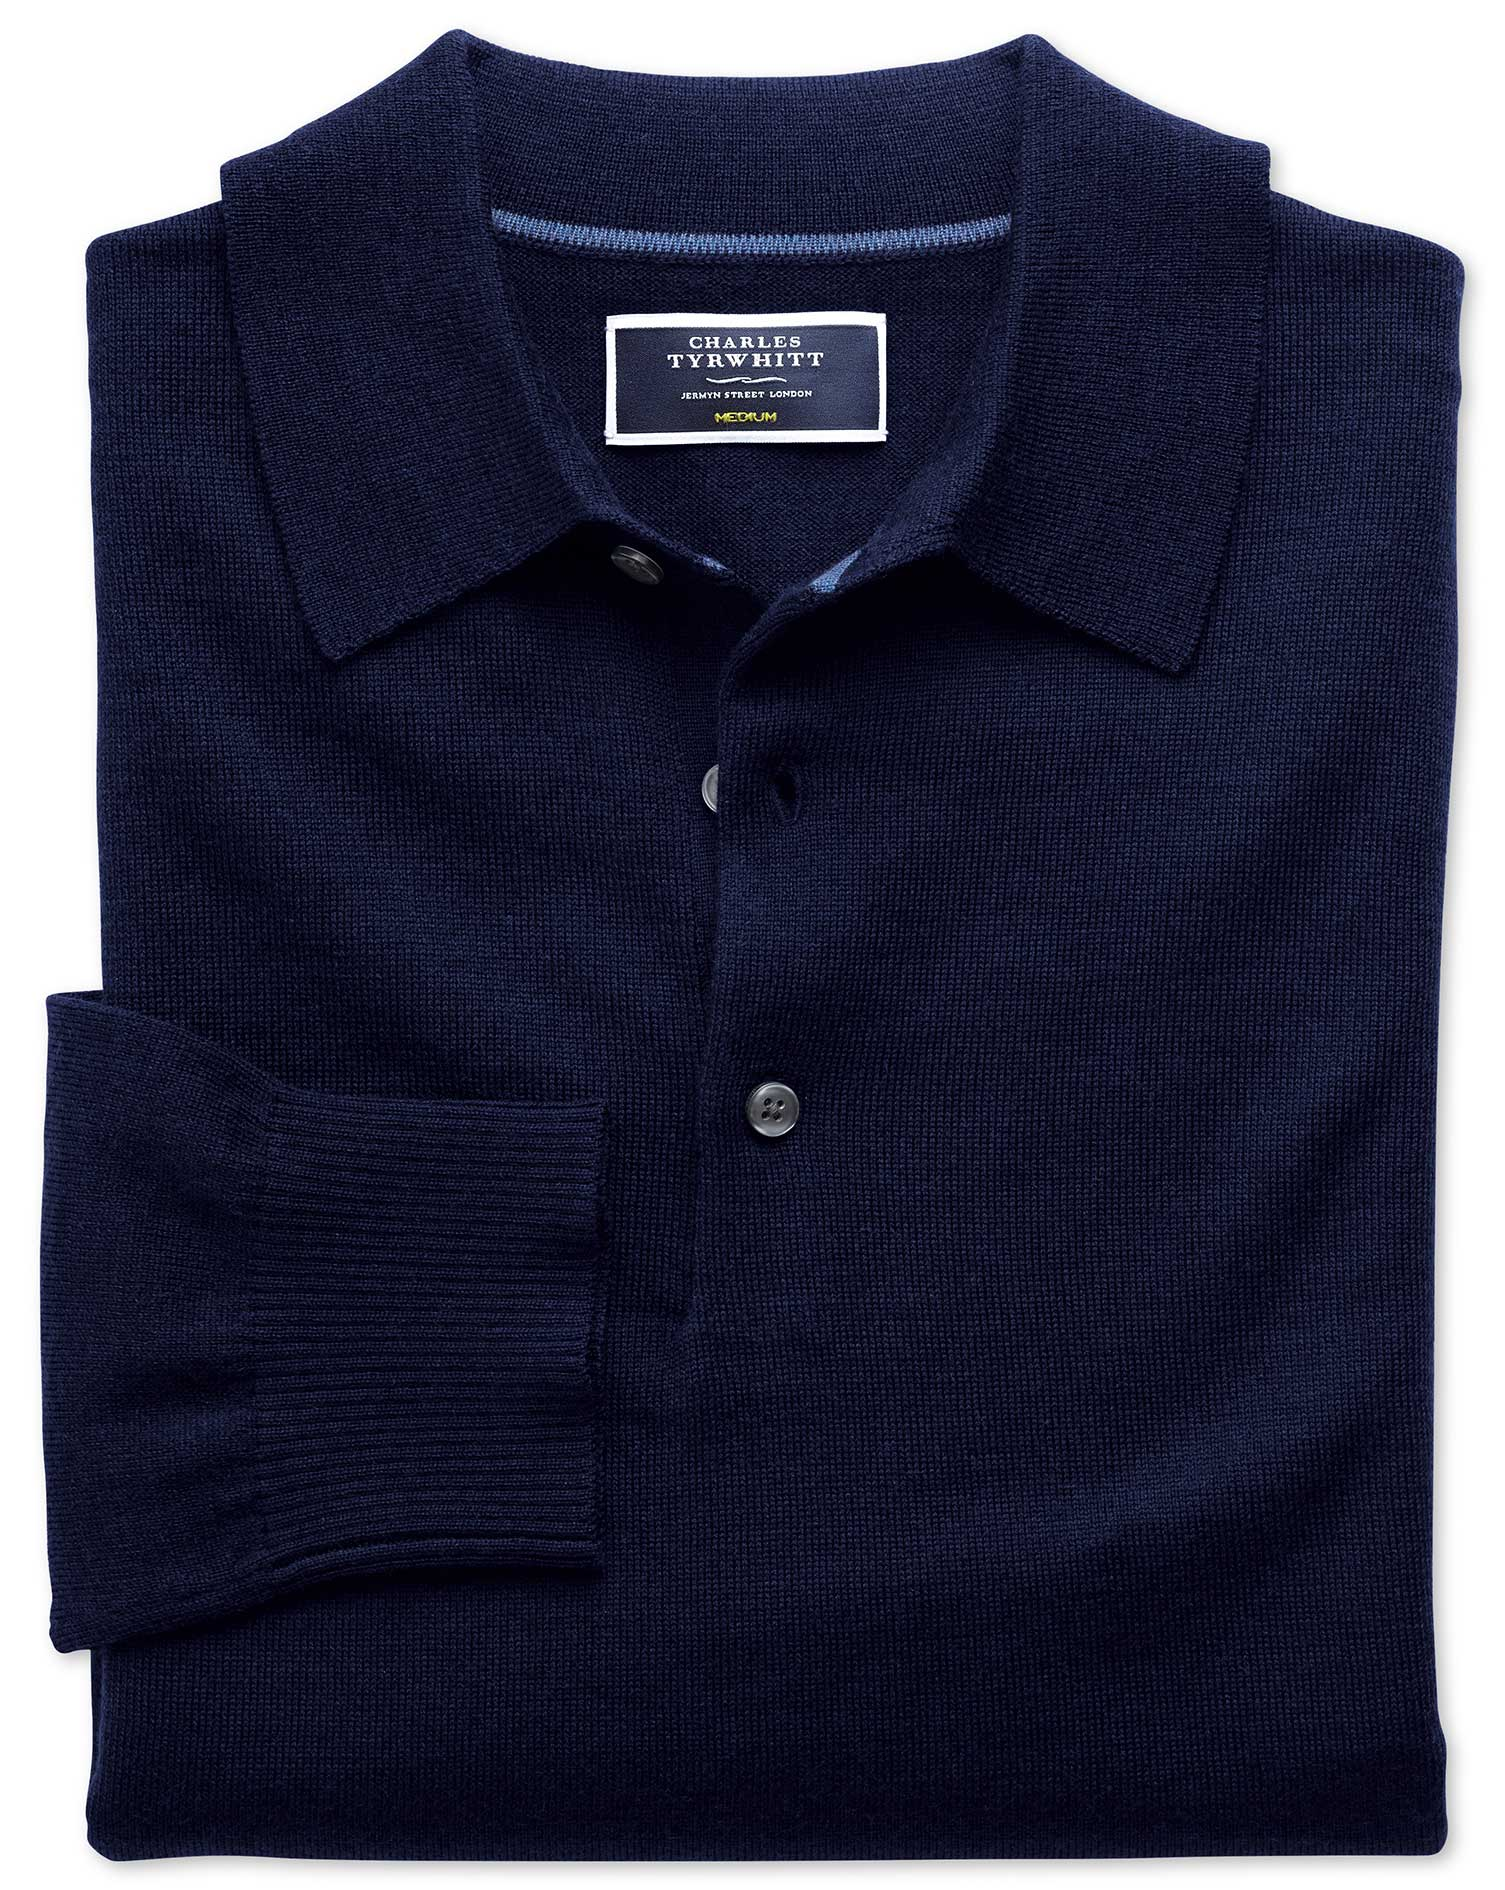 Navy Merino Wool Polo Neck Jumper Size XXXL by Charles Tyrwhitt